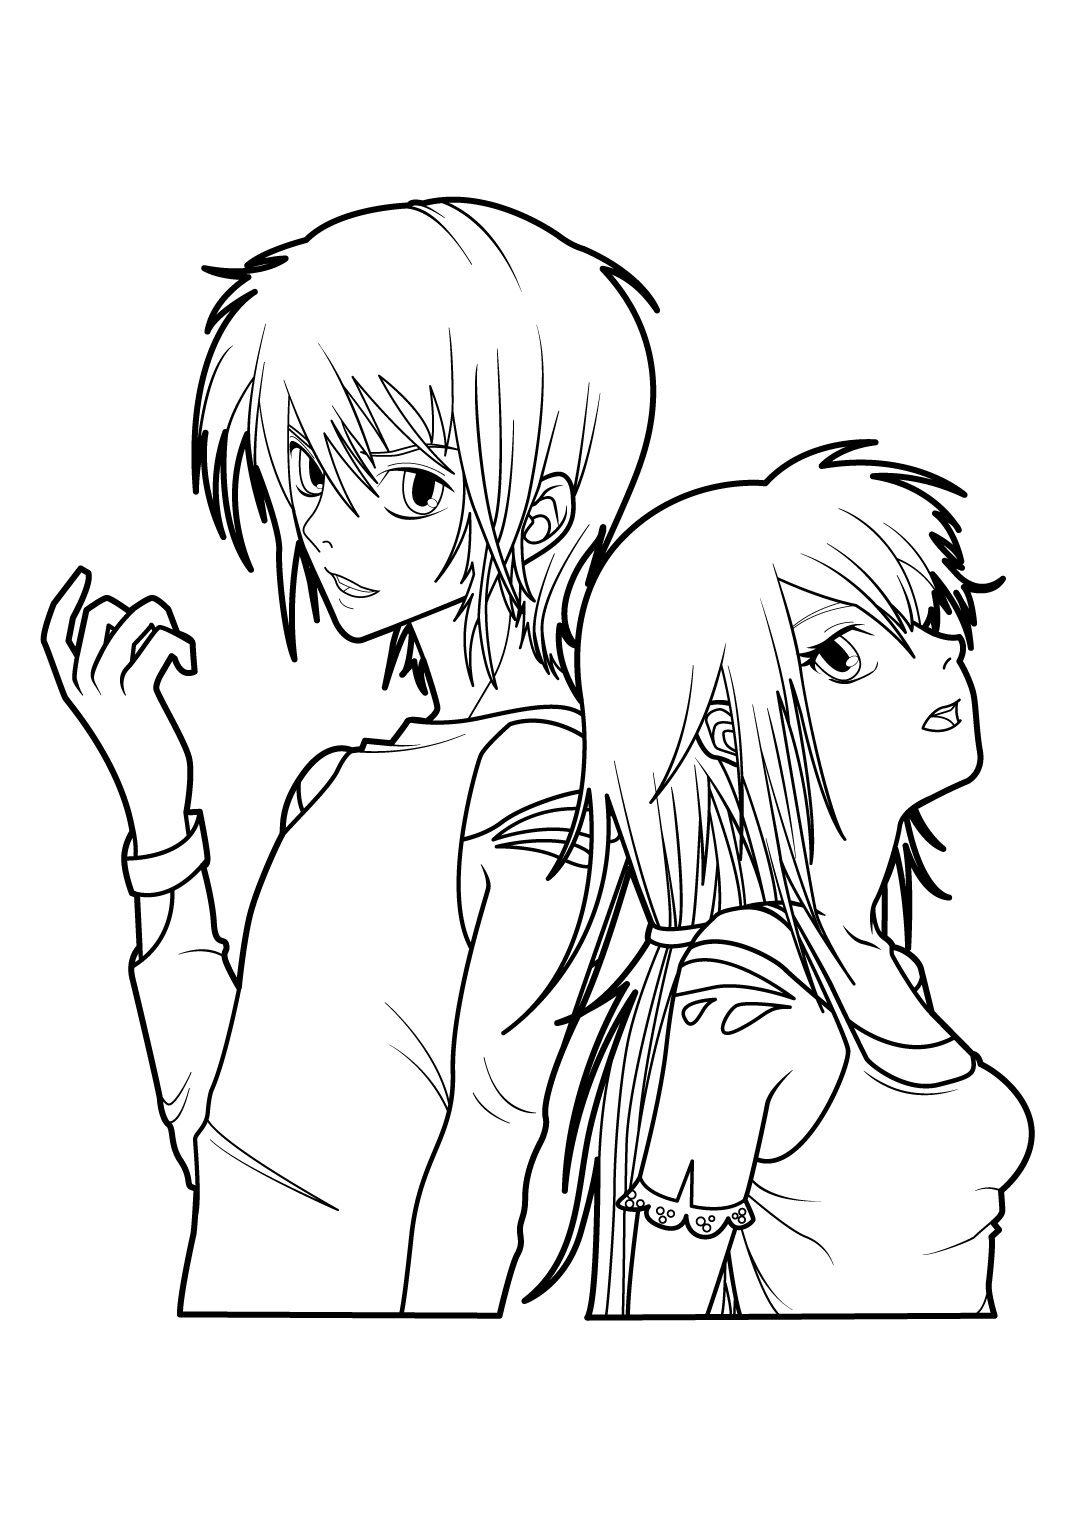 s coloriage manga fille   Coloriage manga, Image coloriage, Coloriage